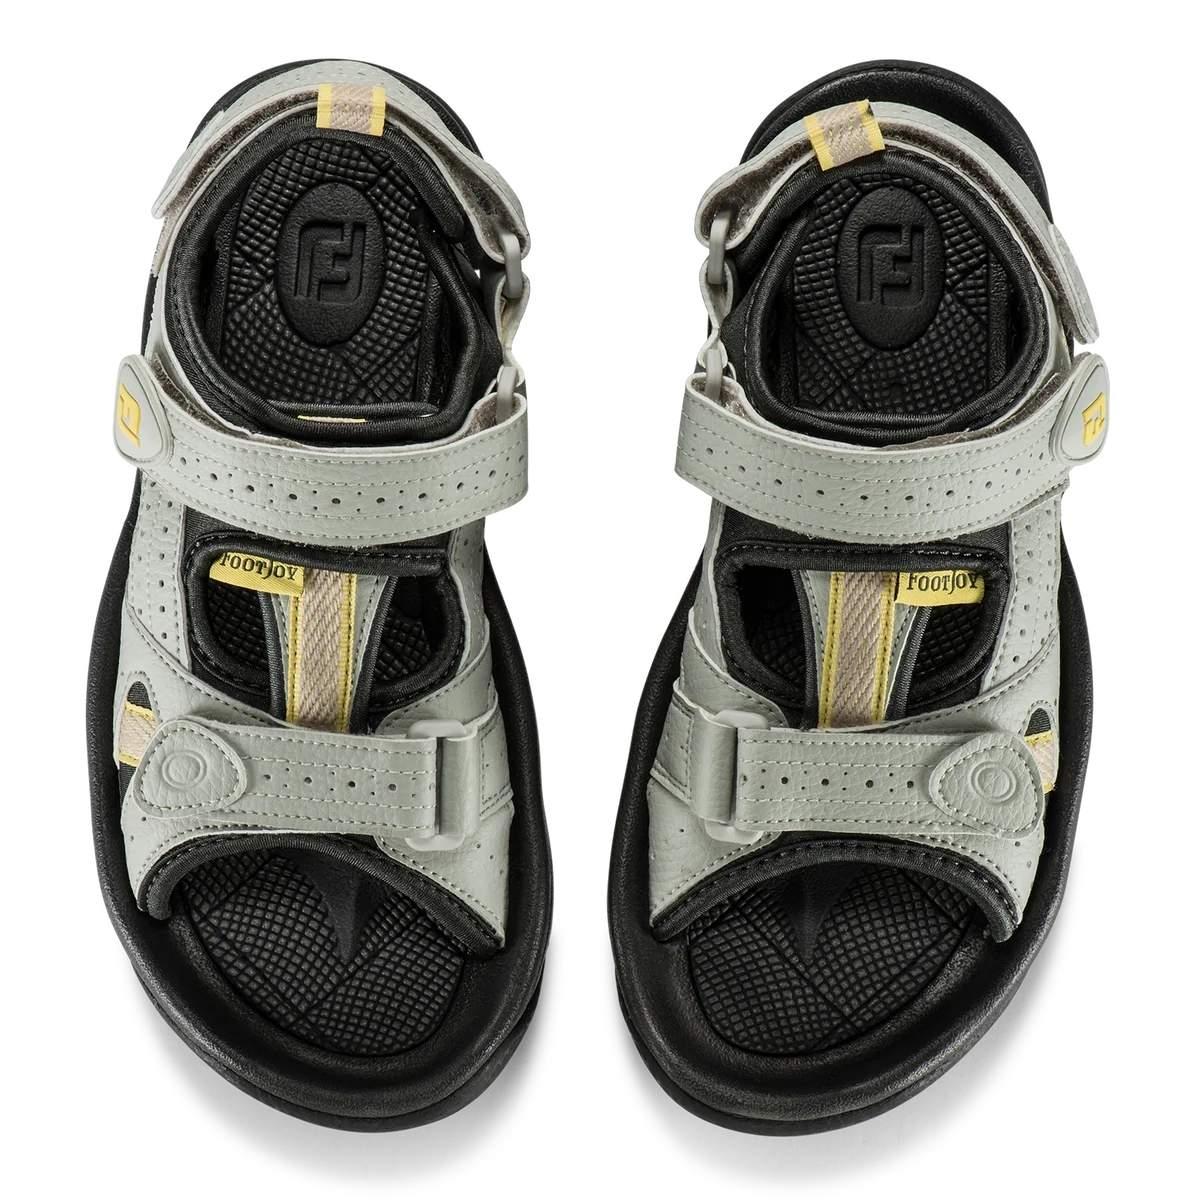 FootJoy Women's Golf Sandal - Style 48444